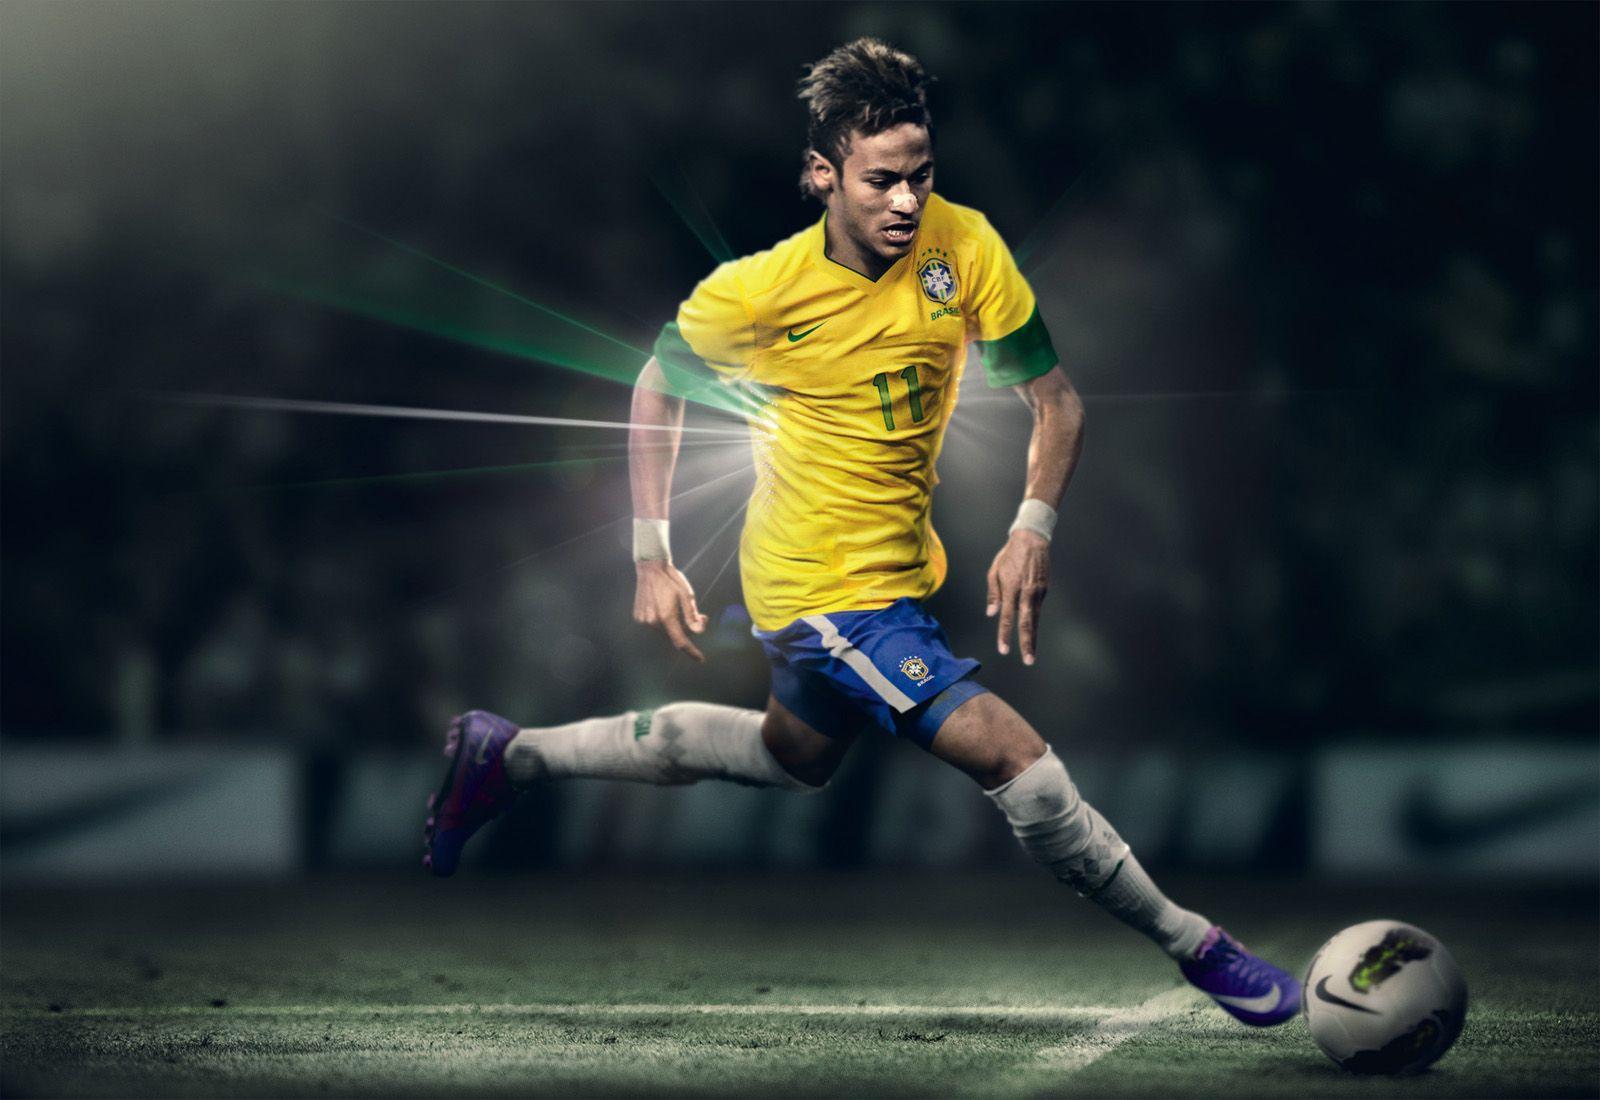 neymar da silva high definiton wallpapers - http://wallucky